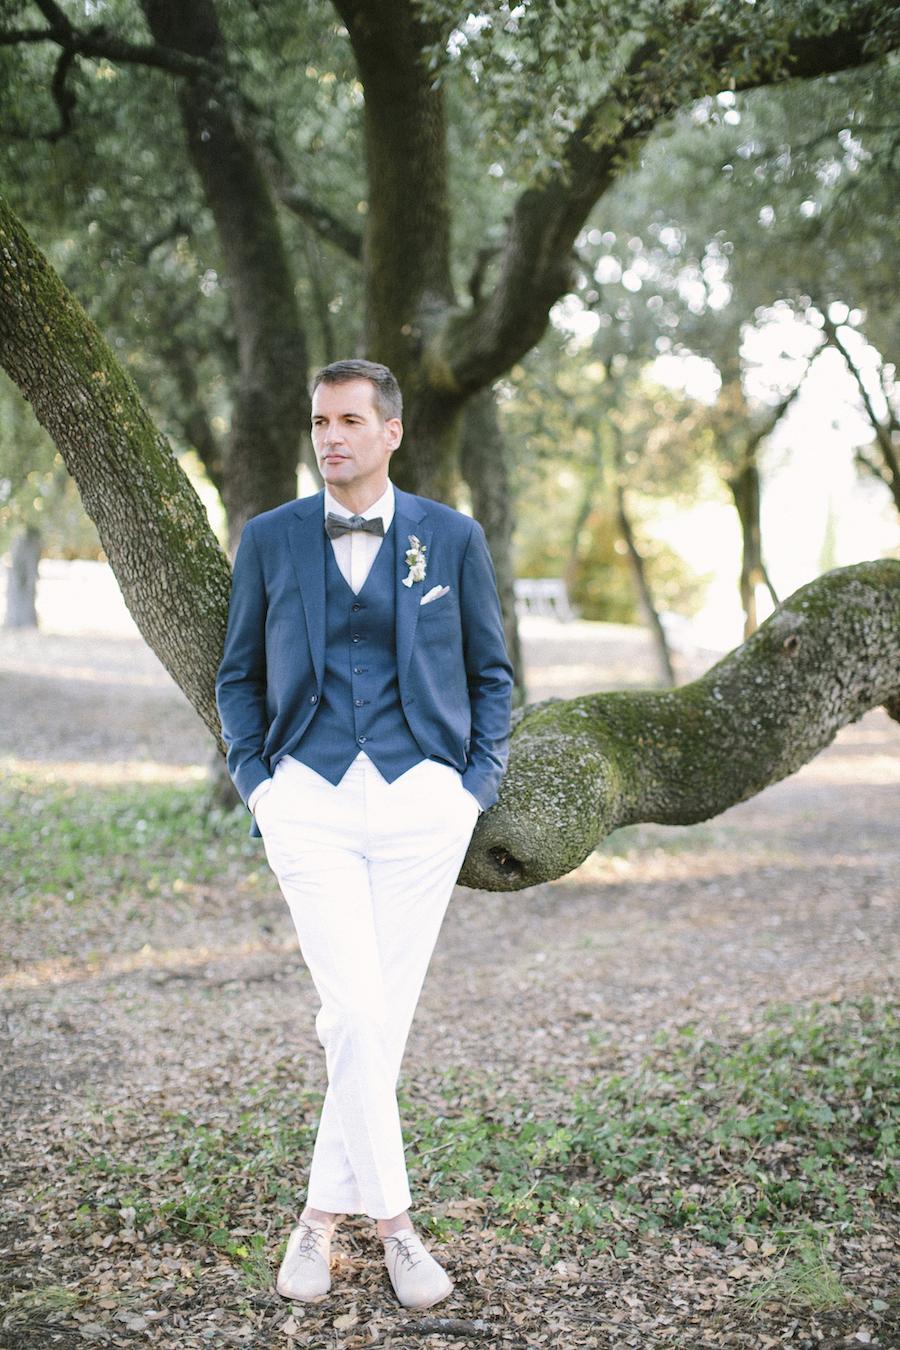 saya-photography-rustic-french-wedding-provence-domaines-de-patras-103.jpg